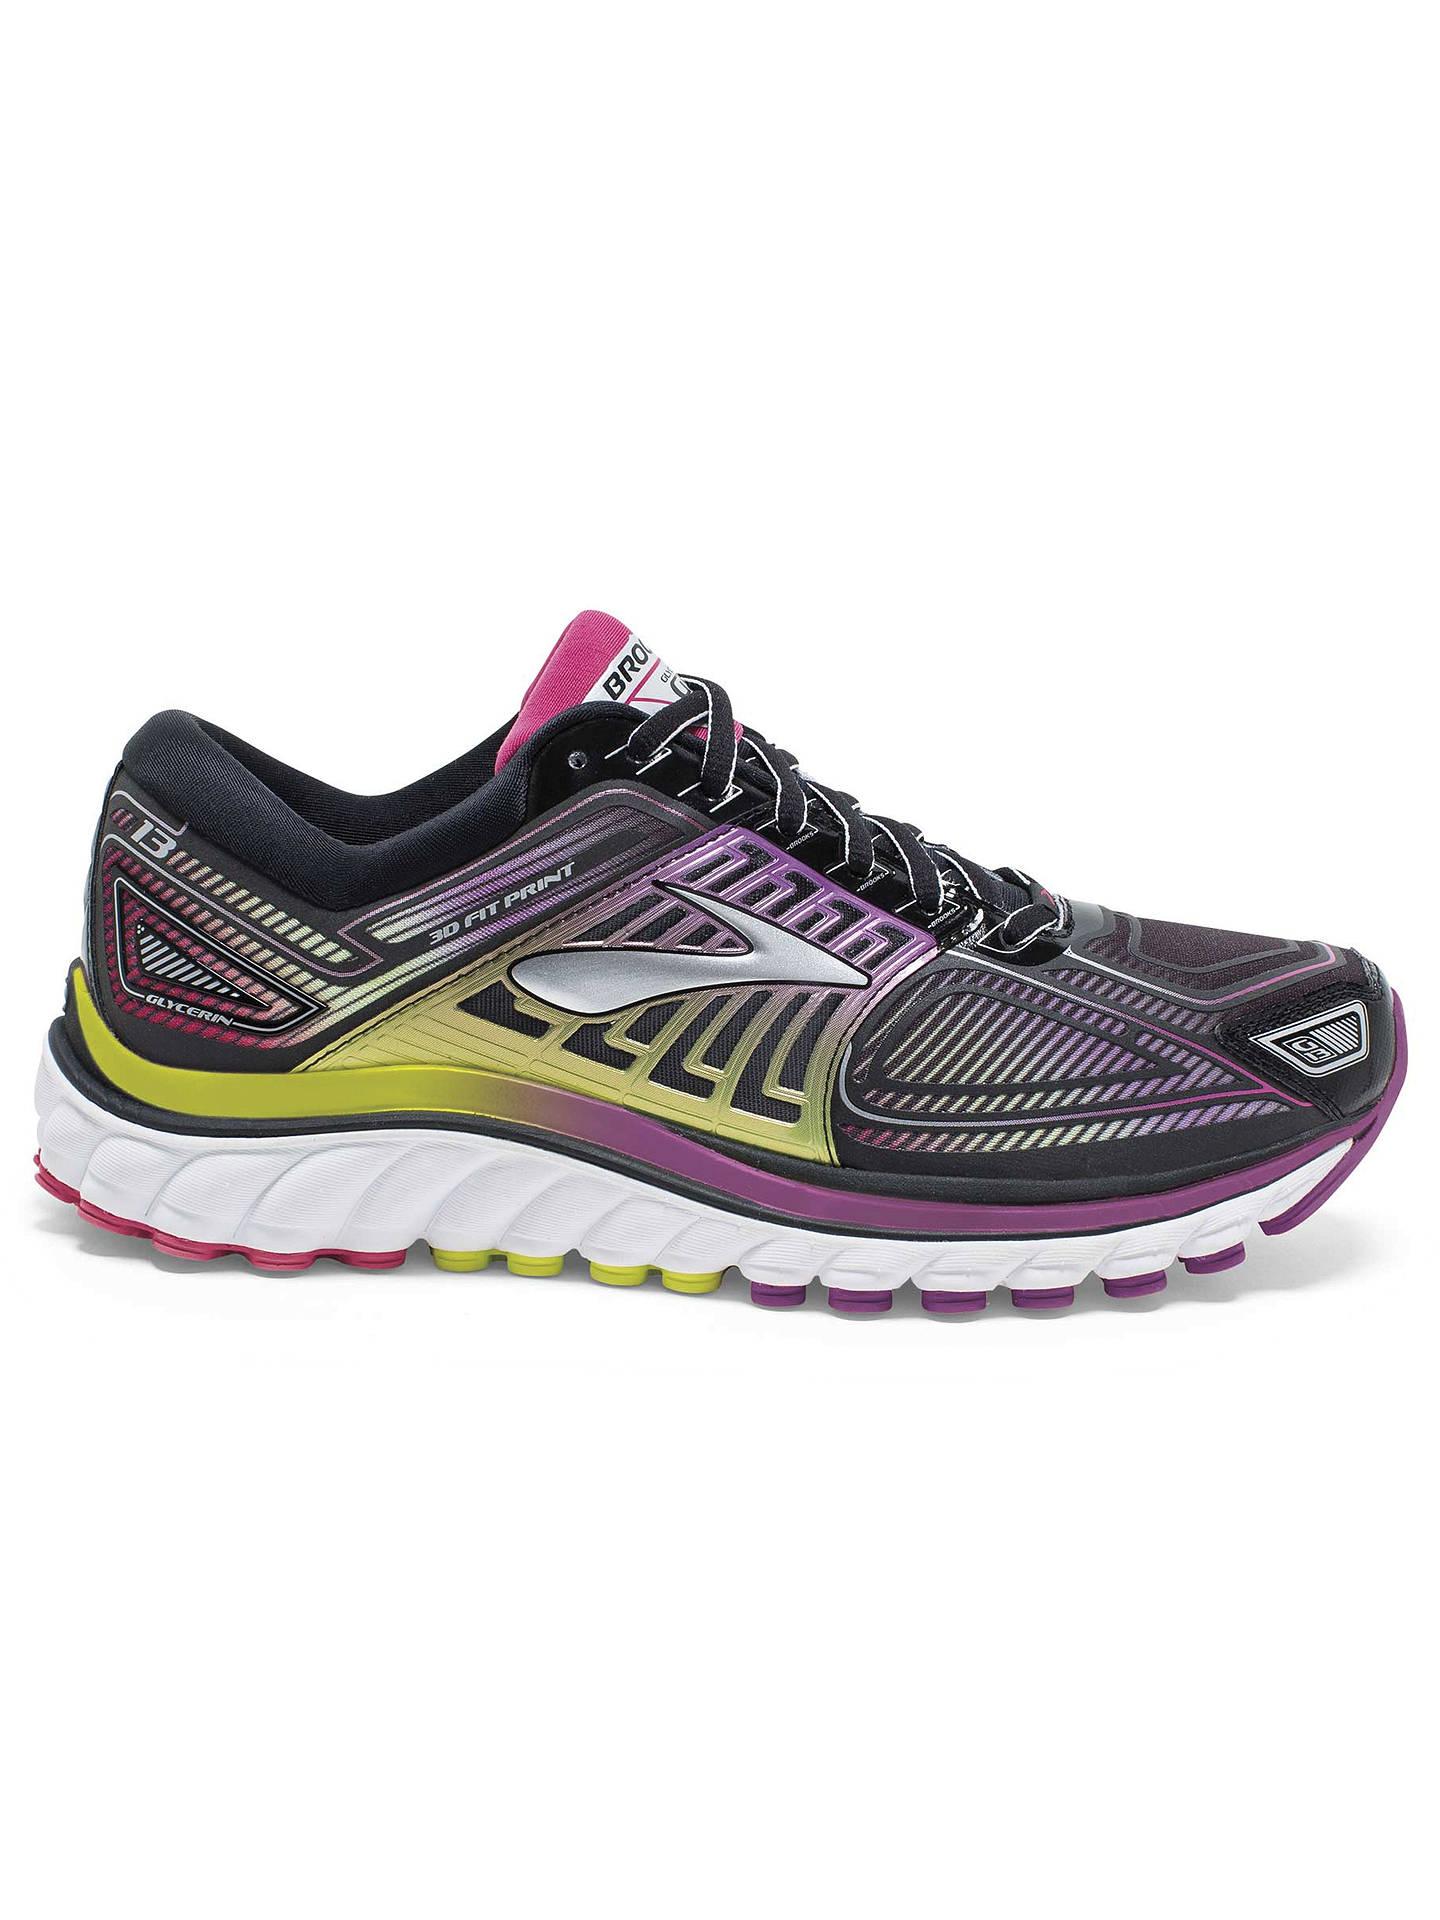 0e4ce36ec63 Buy Brooks Glycerin 13 Women s Running Shoes